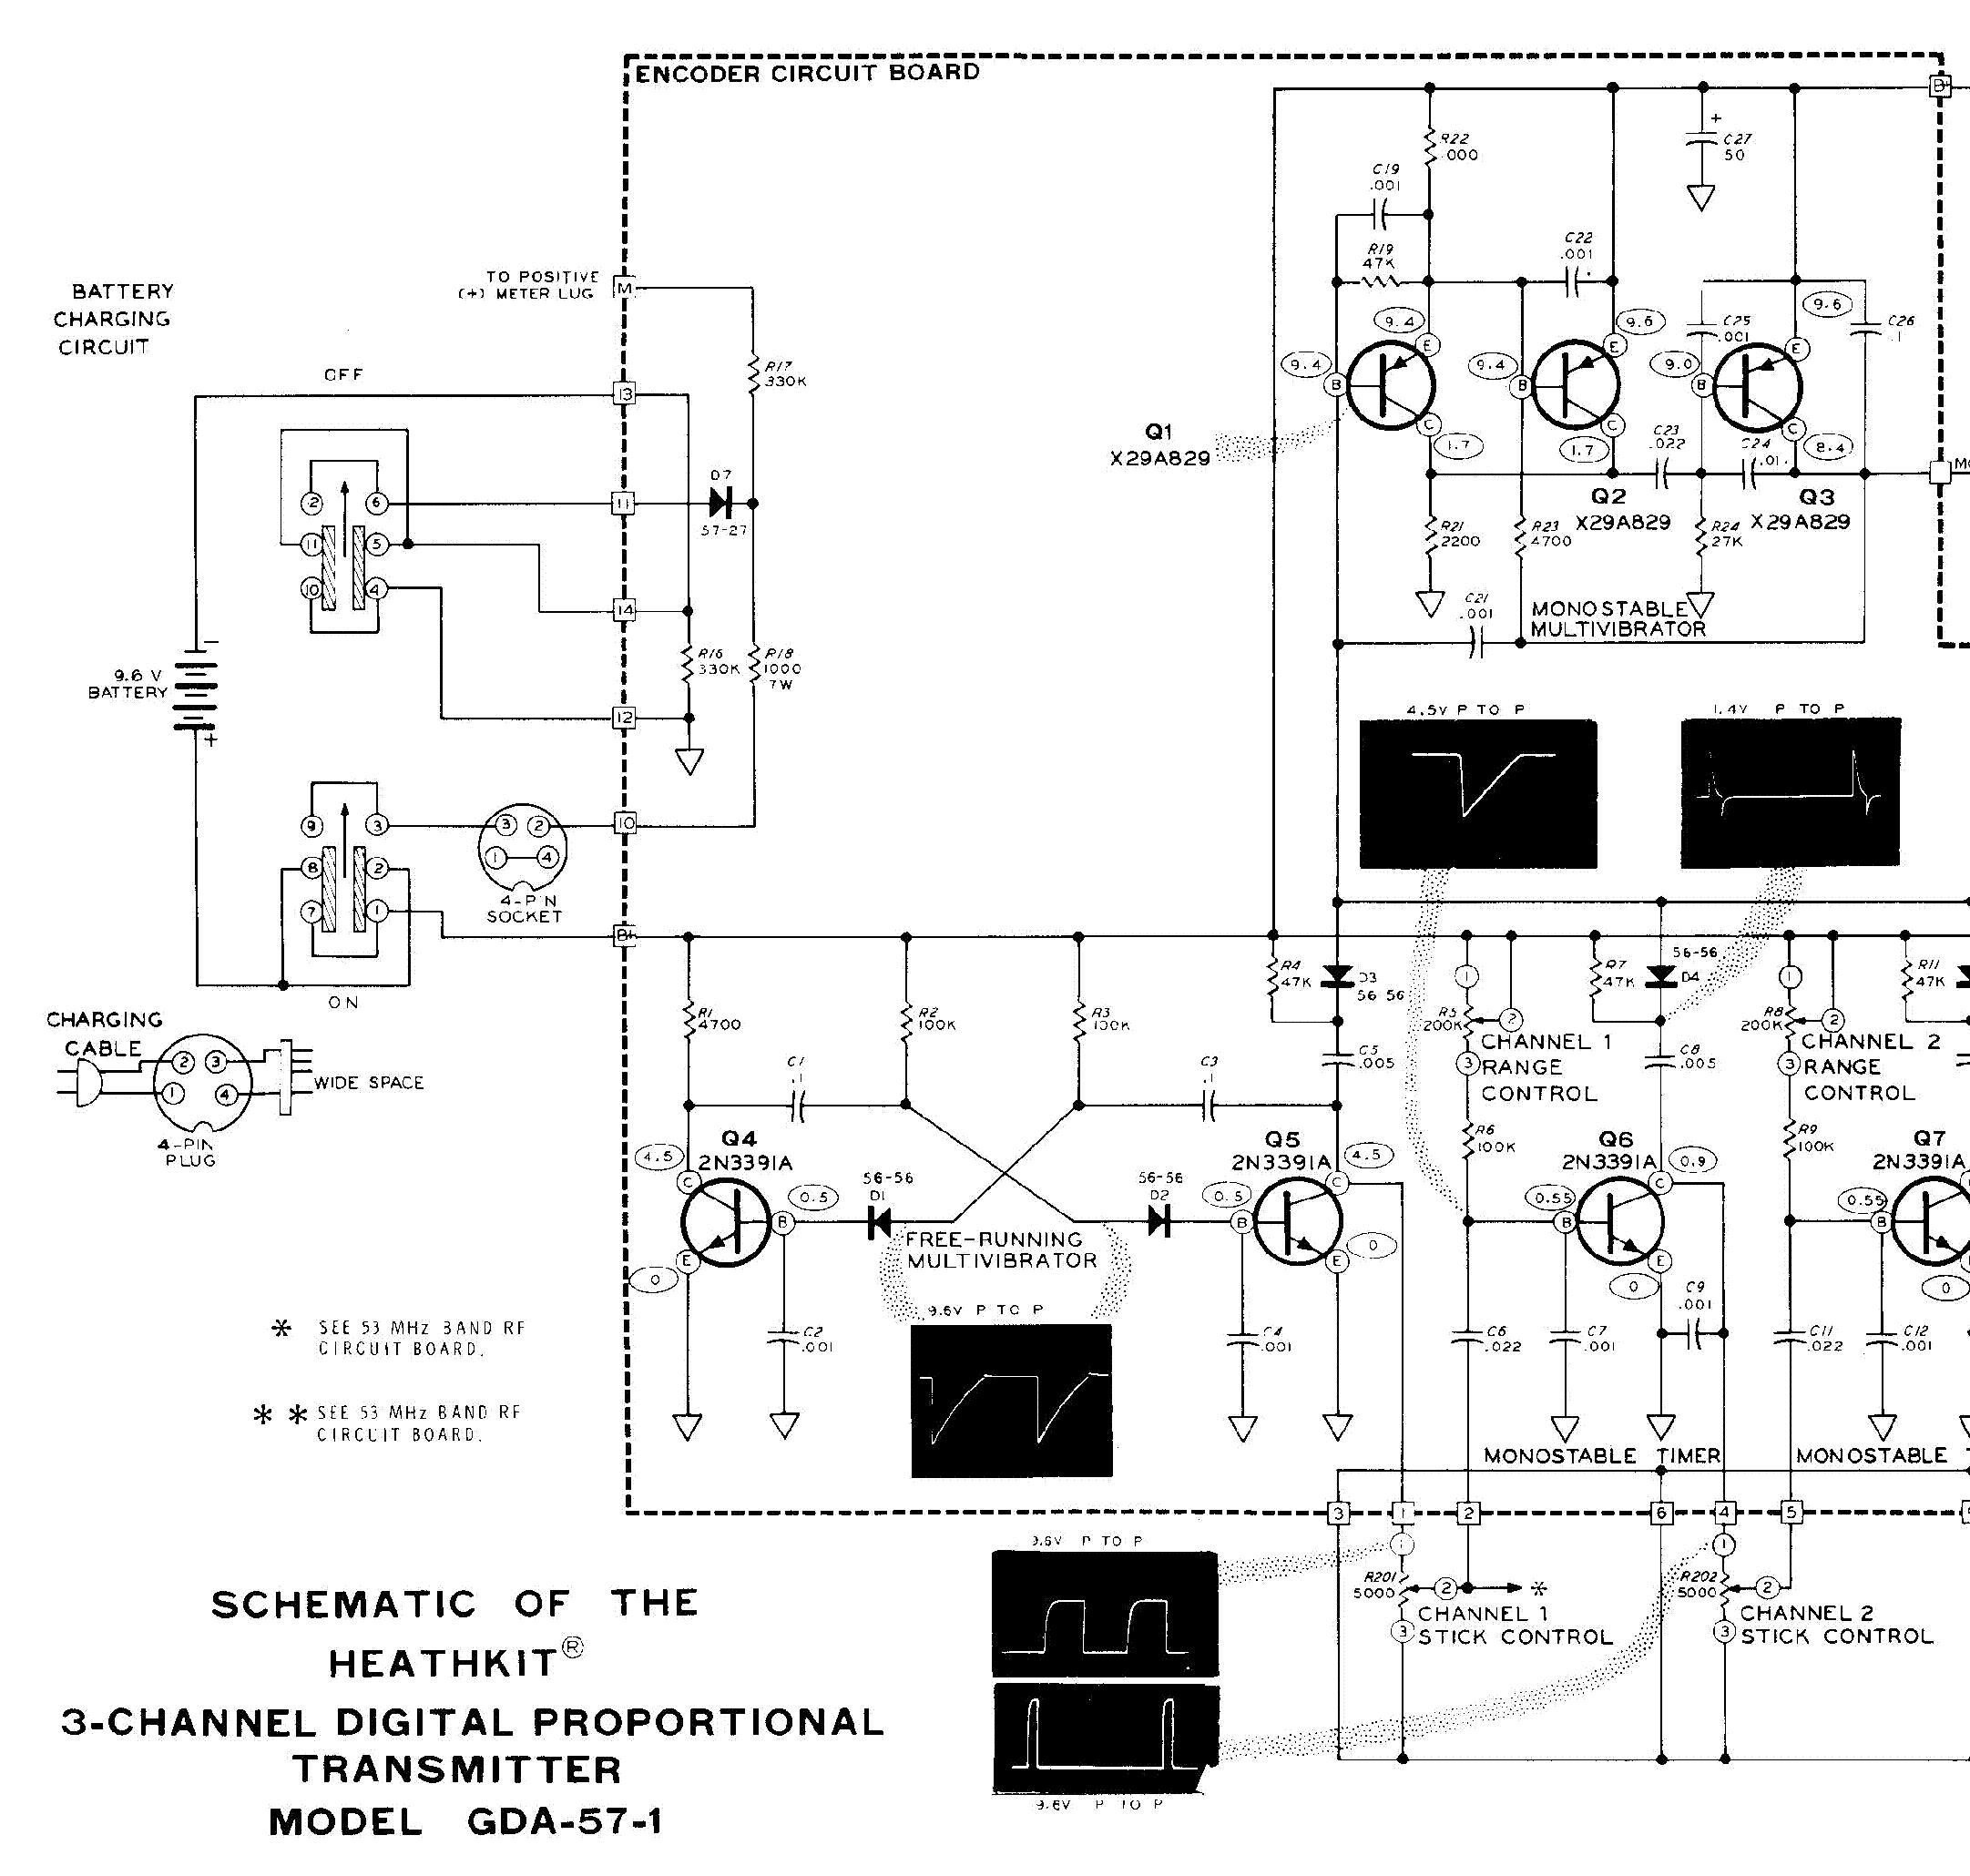 Heathkit Gda 57 1 3 Channel Rc Transmitter Sm Service Manual Download Schematics Eeprom